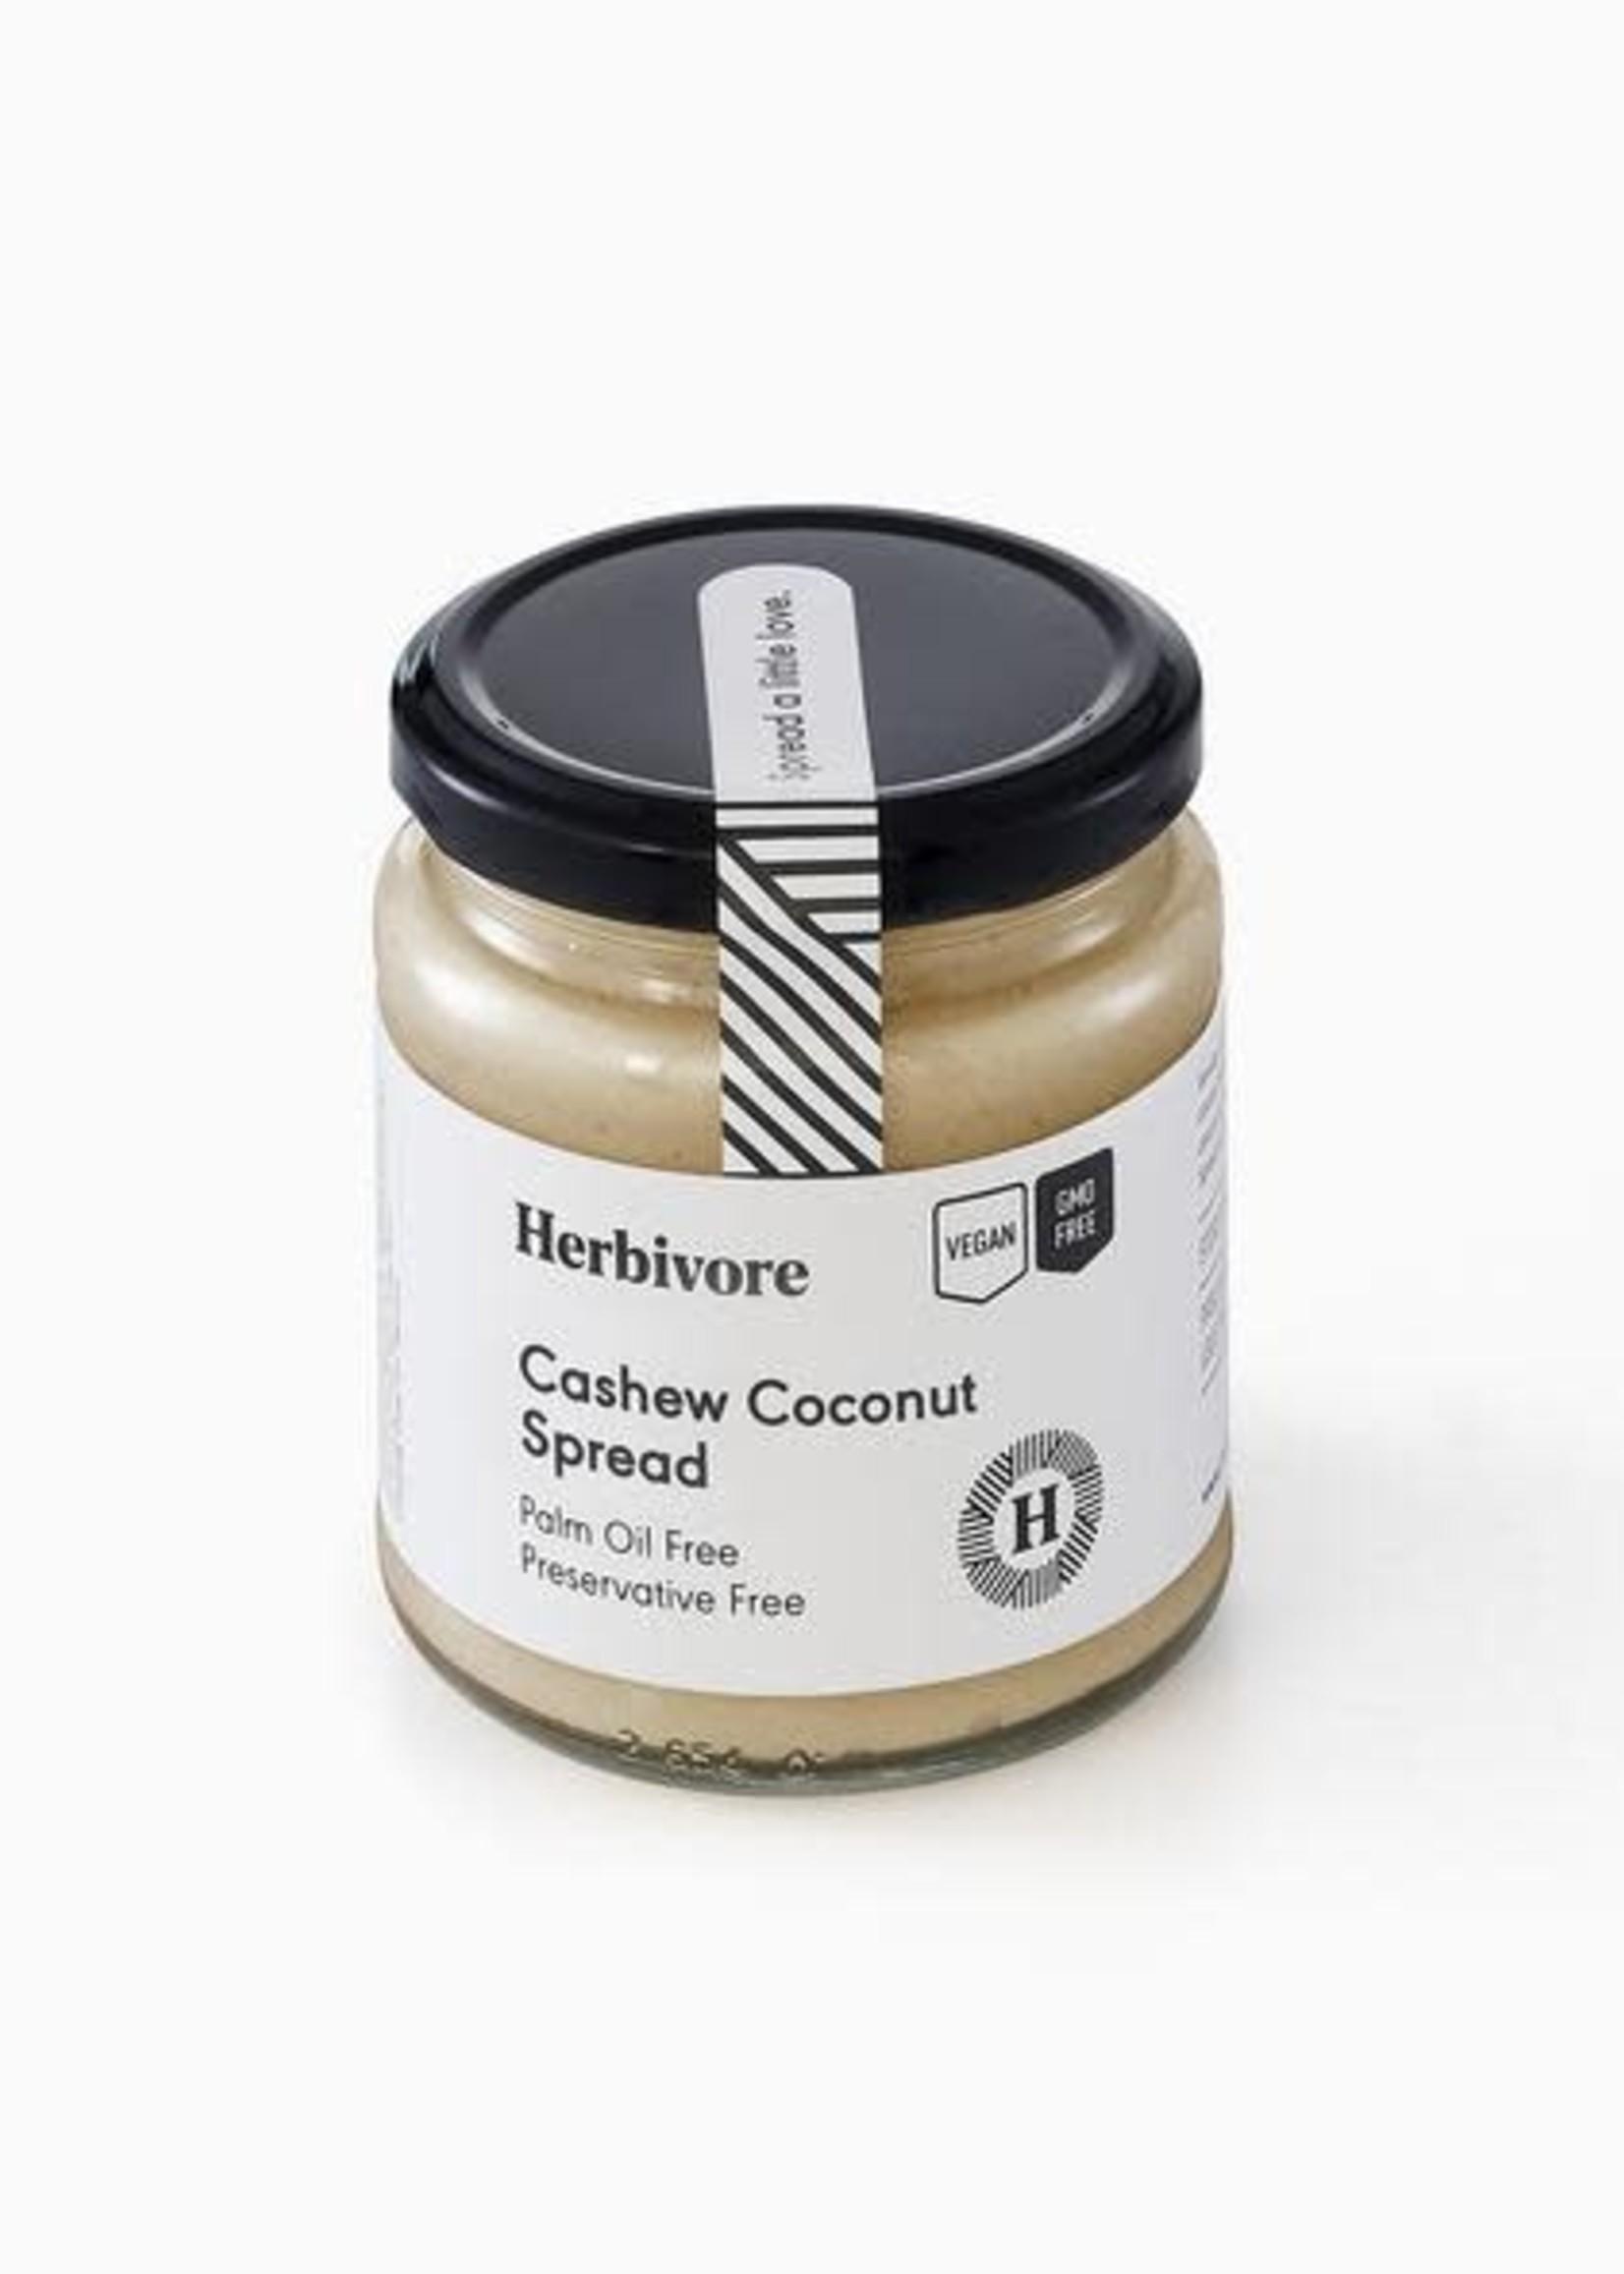 Herbivore - Cashew Coconut spread